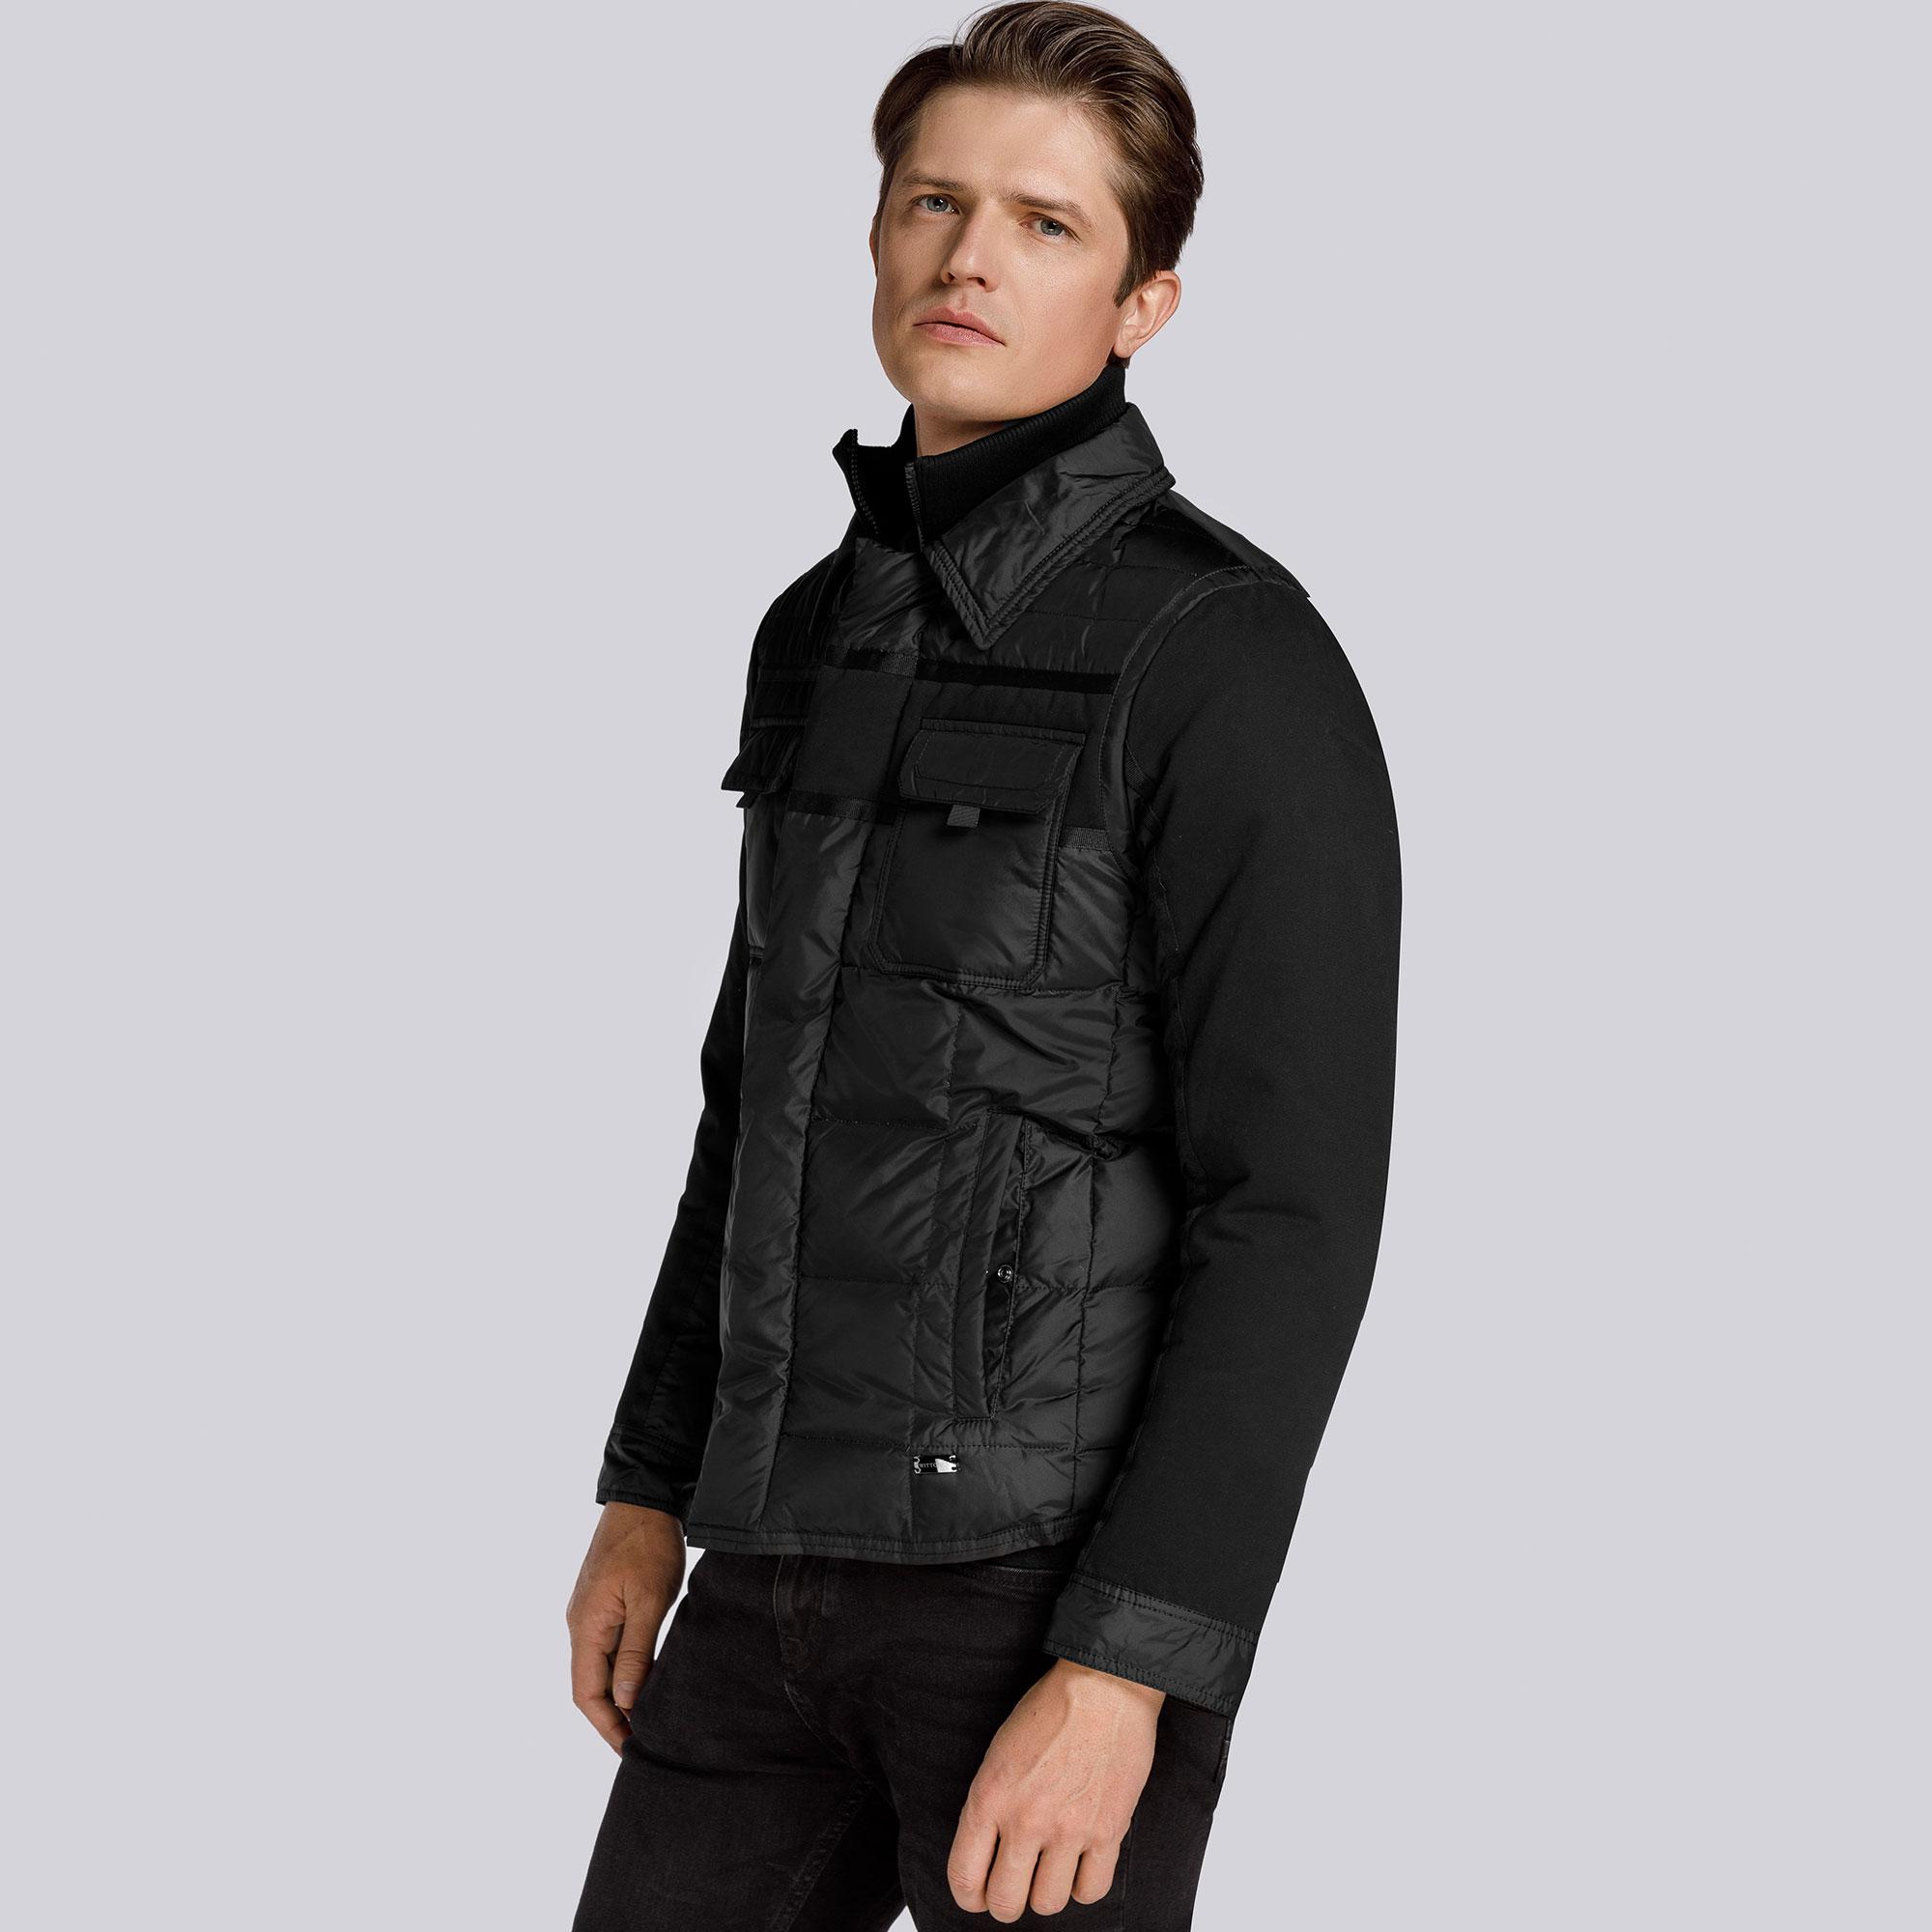 Куртка мужская Wittchen 85-9D-351-1, черныйКуртка мужская<br><br>секс: мужчина<br>Цвет: черный<br>Размер INT: XXXL<br>материал:: Полиэстер